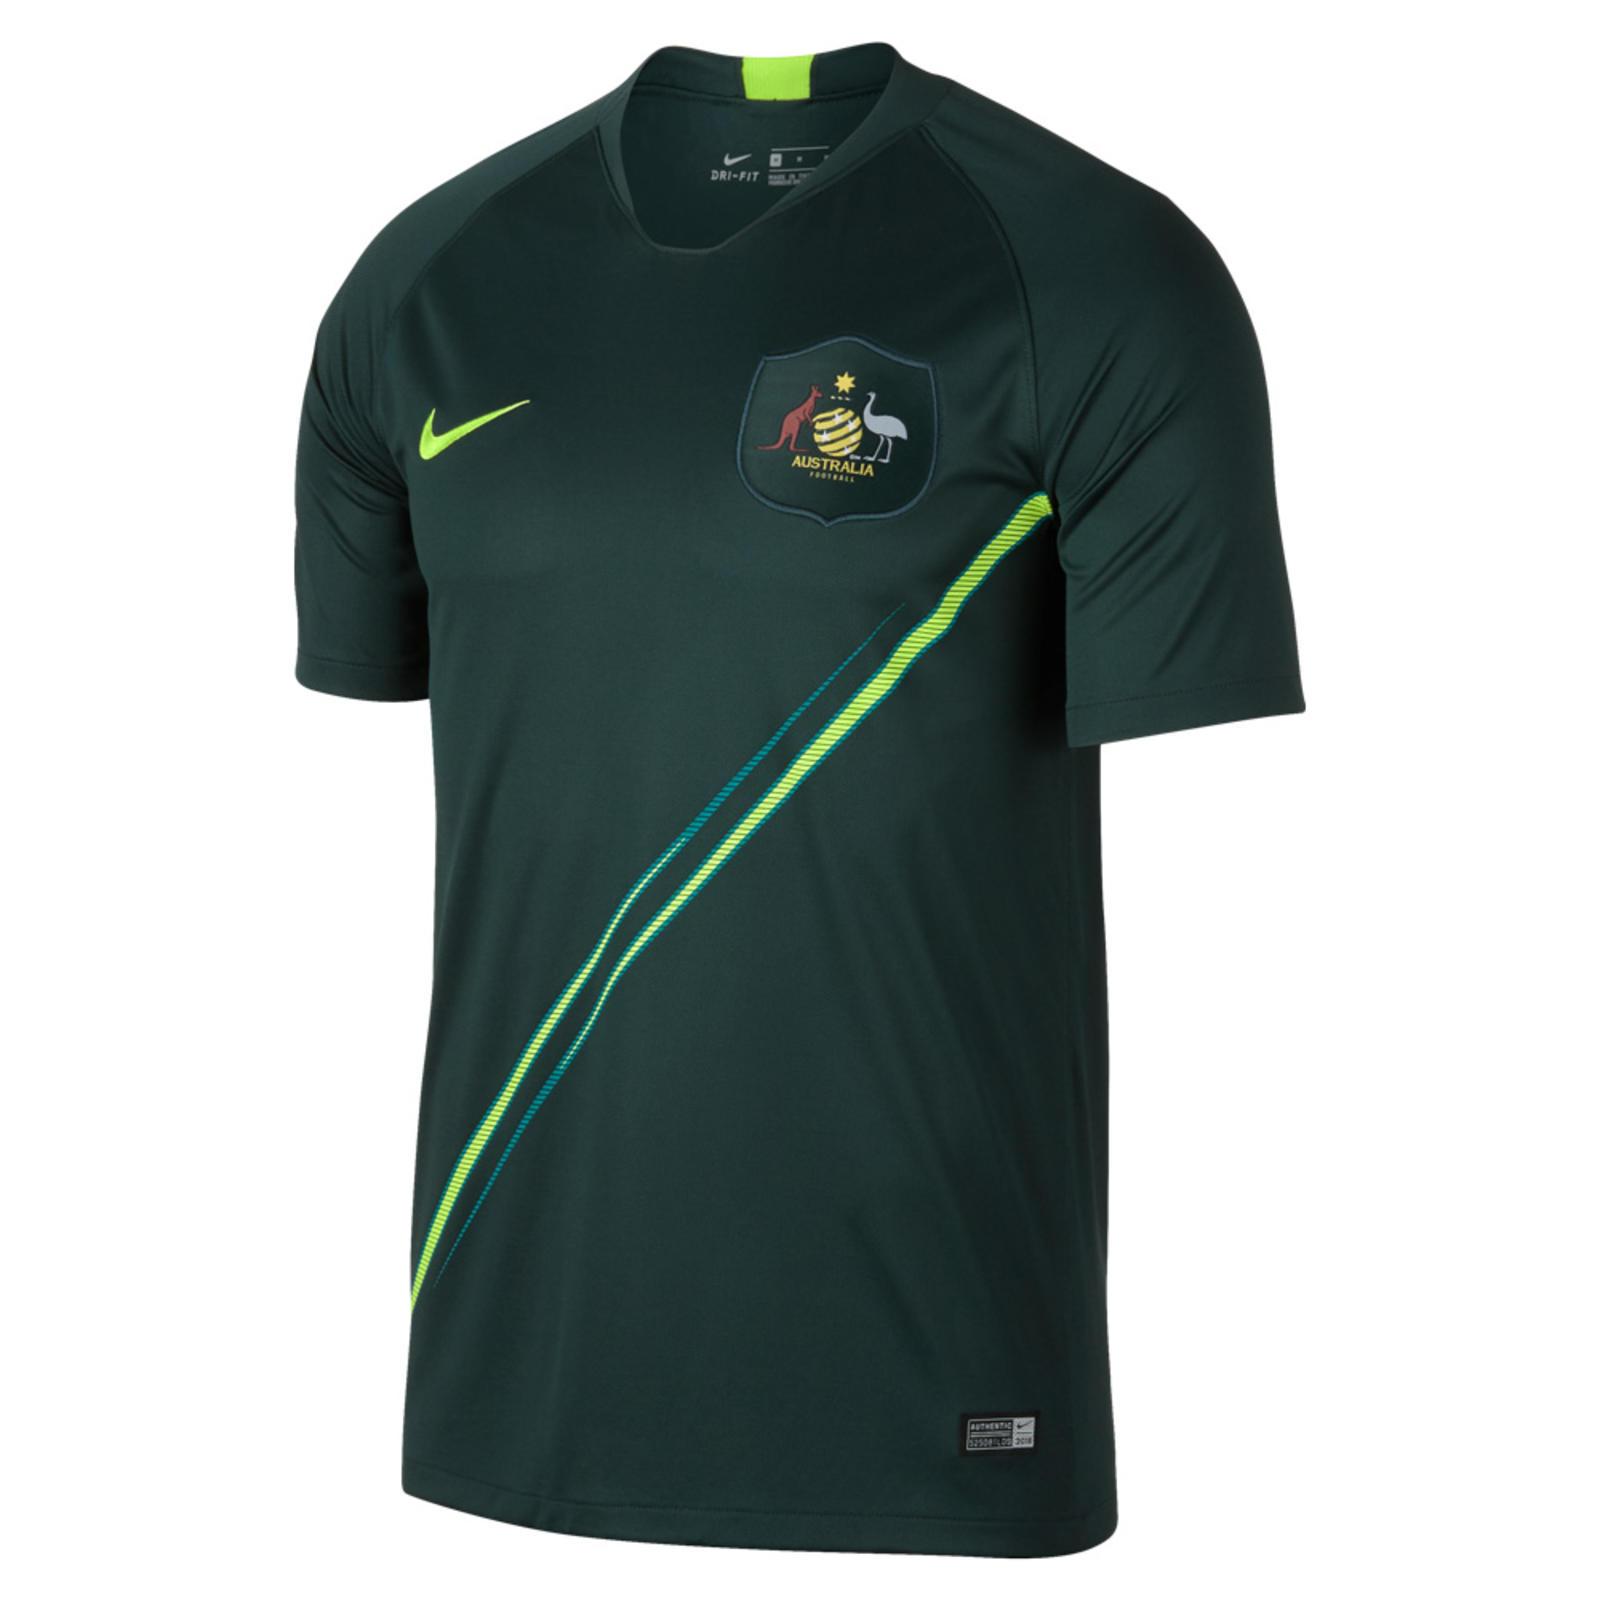 893984ef9d Australia's New Kit Honors Footballing Pioneers - Nike News